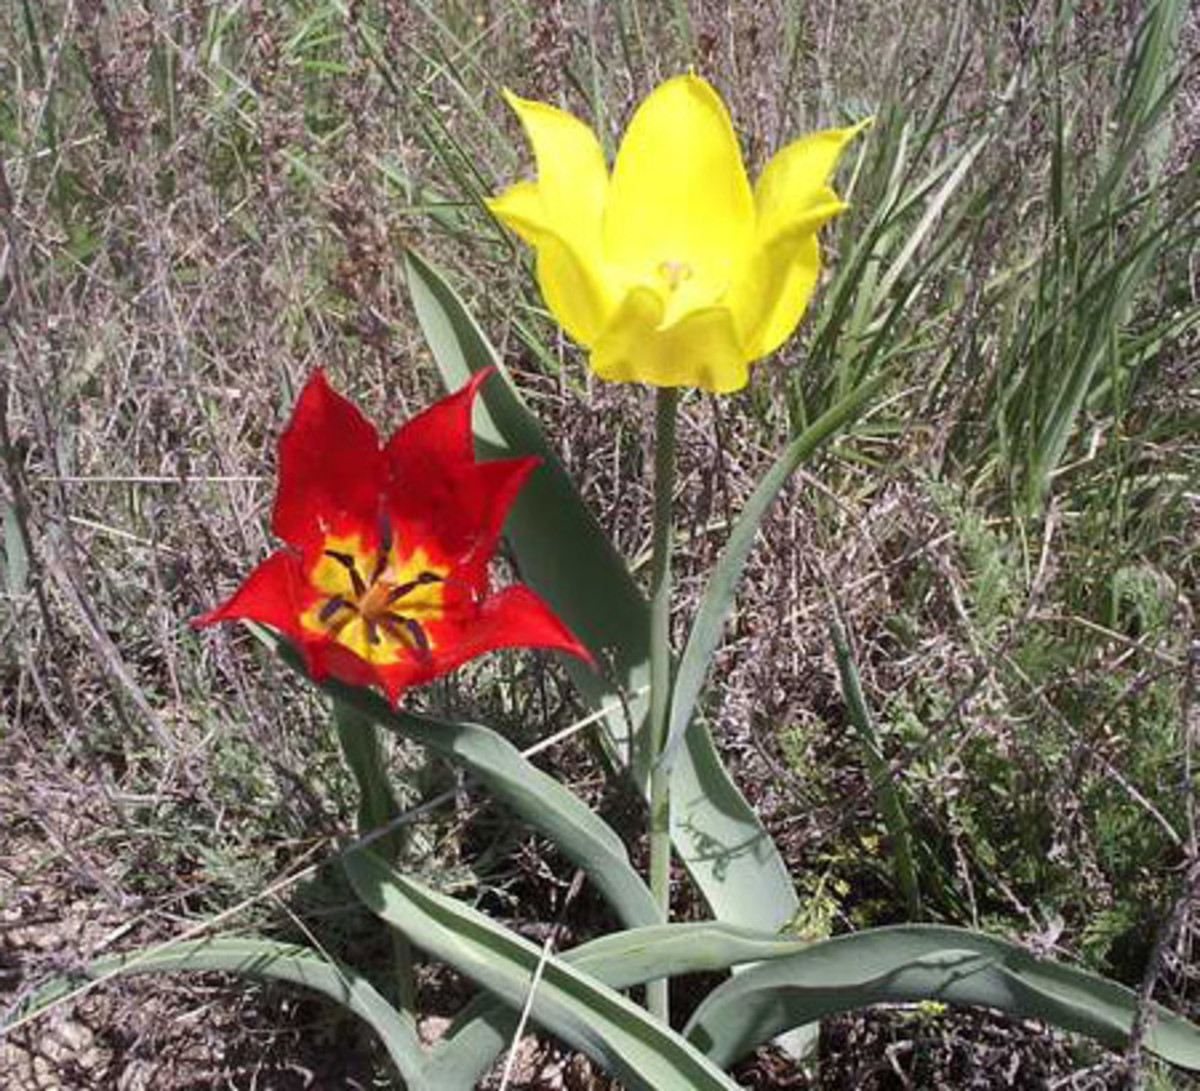 Tulipa gesneriana, one of the parent species of modern tulip cultivars.